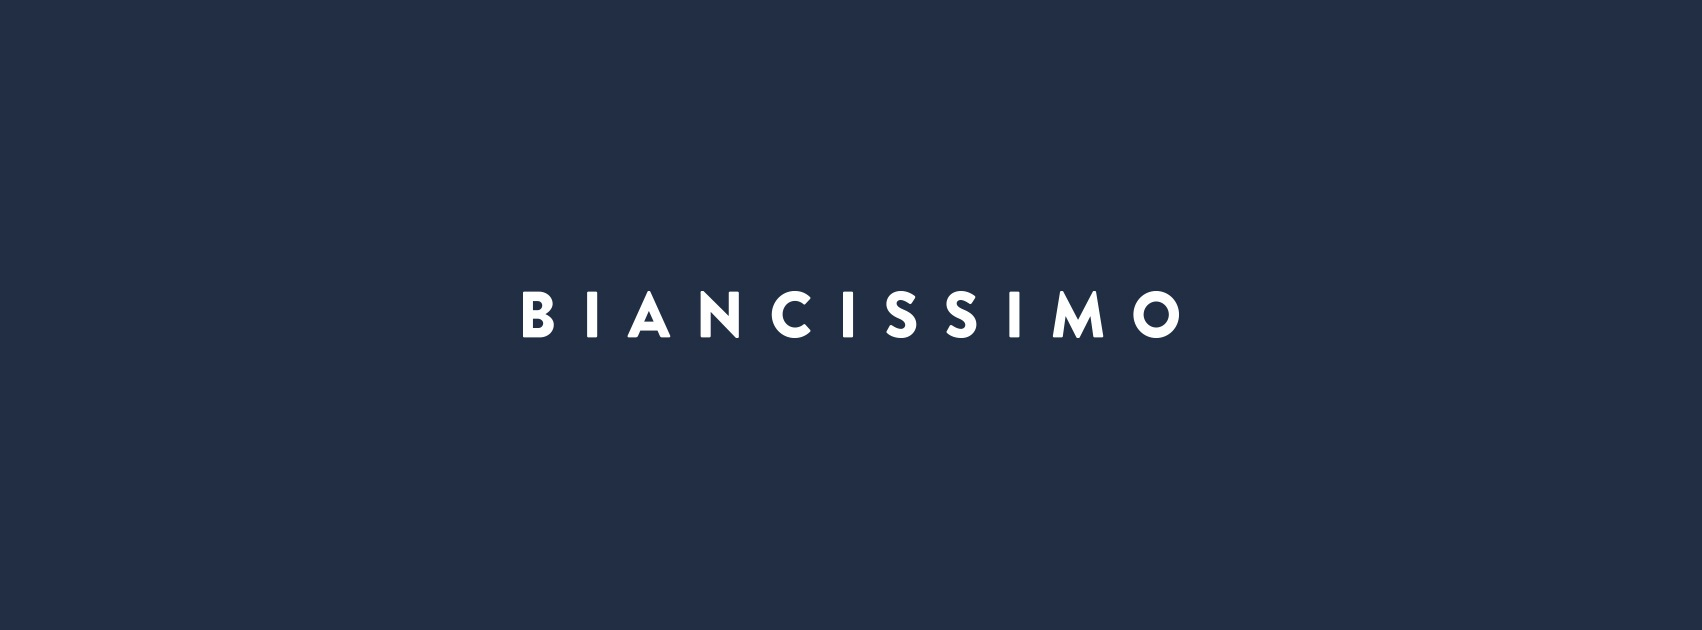 biancissimo-logo-header.jpg